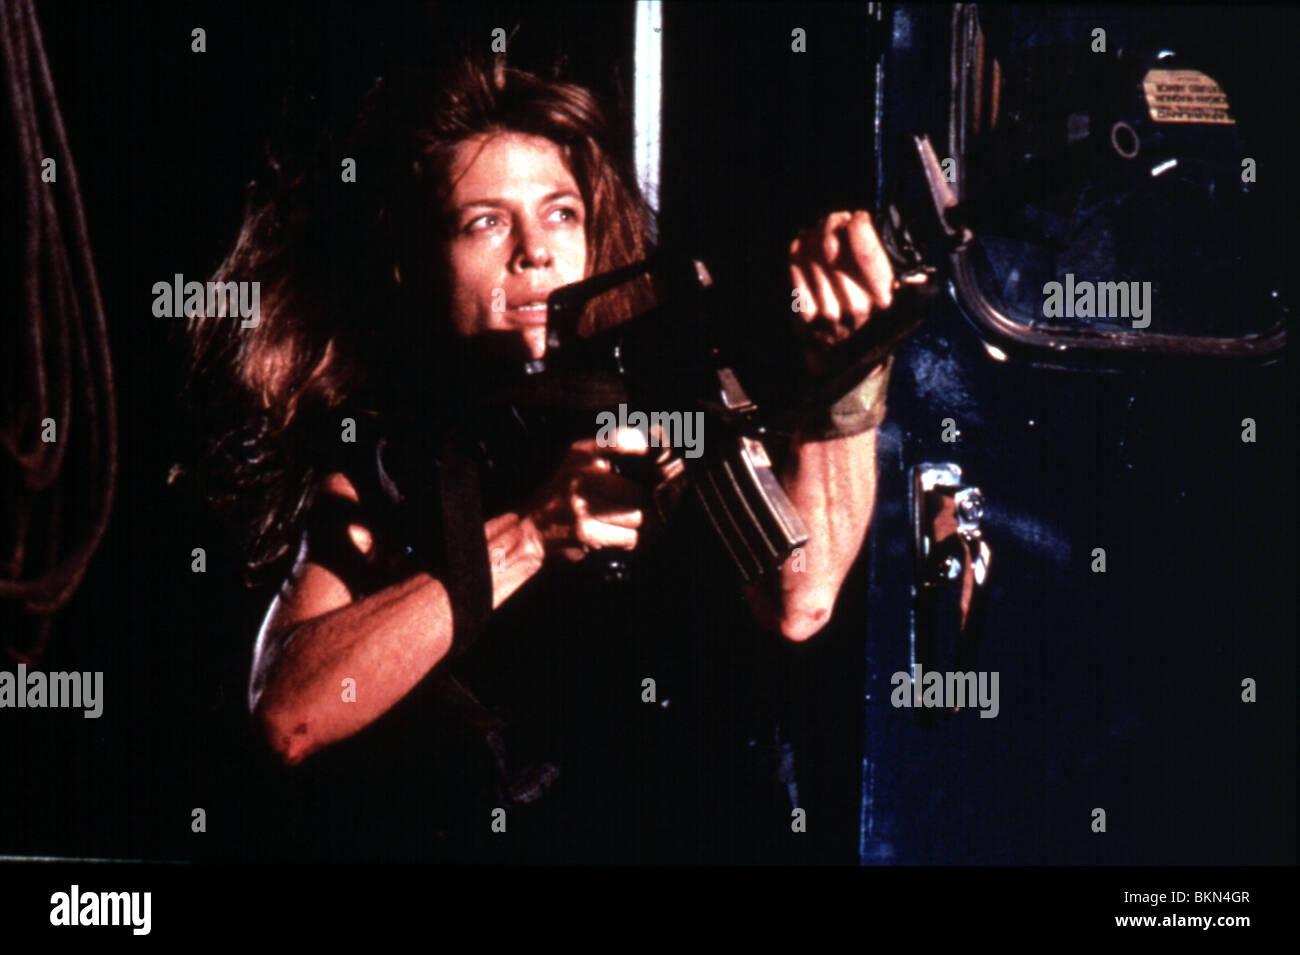 TERMINATOR 2: JUDGEMENT DAY (1991) LINDA HAMILTON TR2 083 - Stock Image